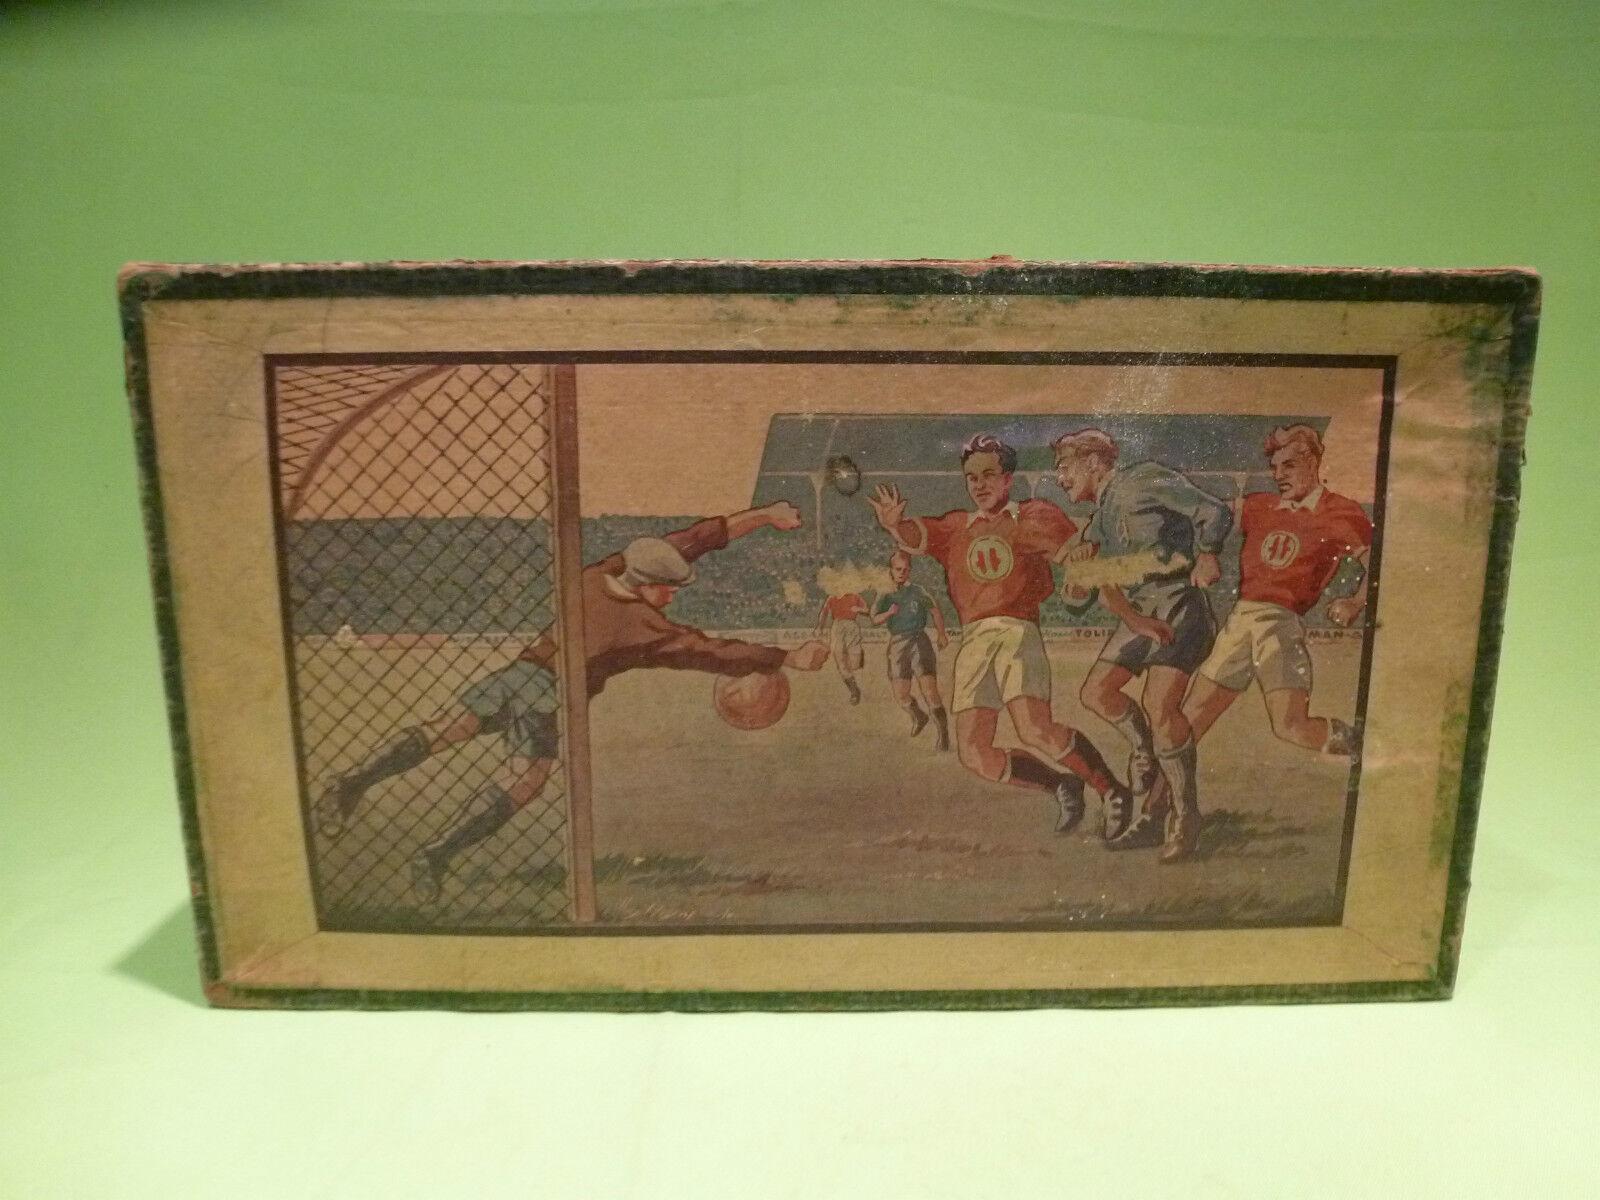 VINTAGE - GERMAN -  FOOTBALL SOCCER GAME - 1920 30's 40's - GOOD - ORIGINAL BOX